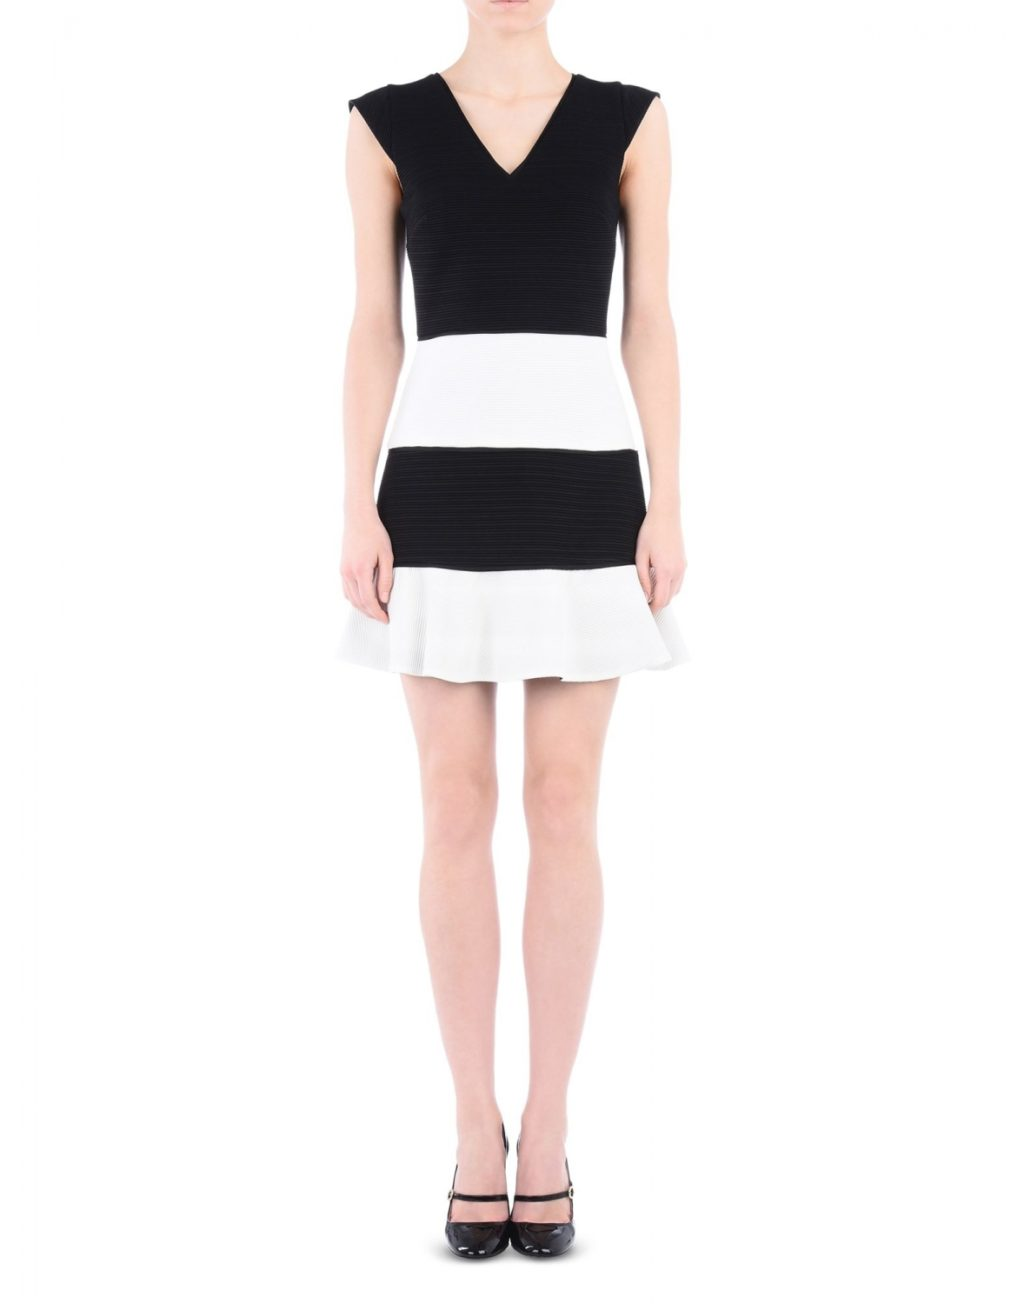 Boutique Moschino Sort & Hvid Kjole